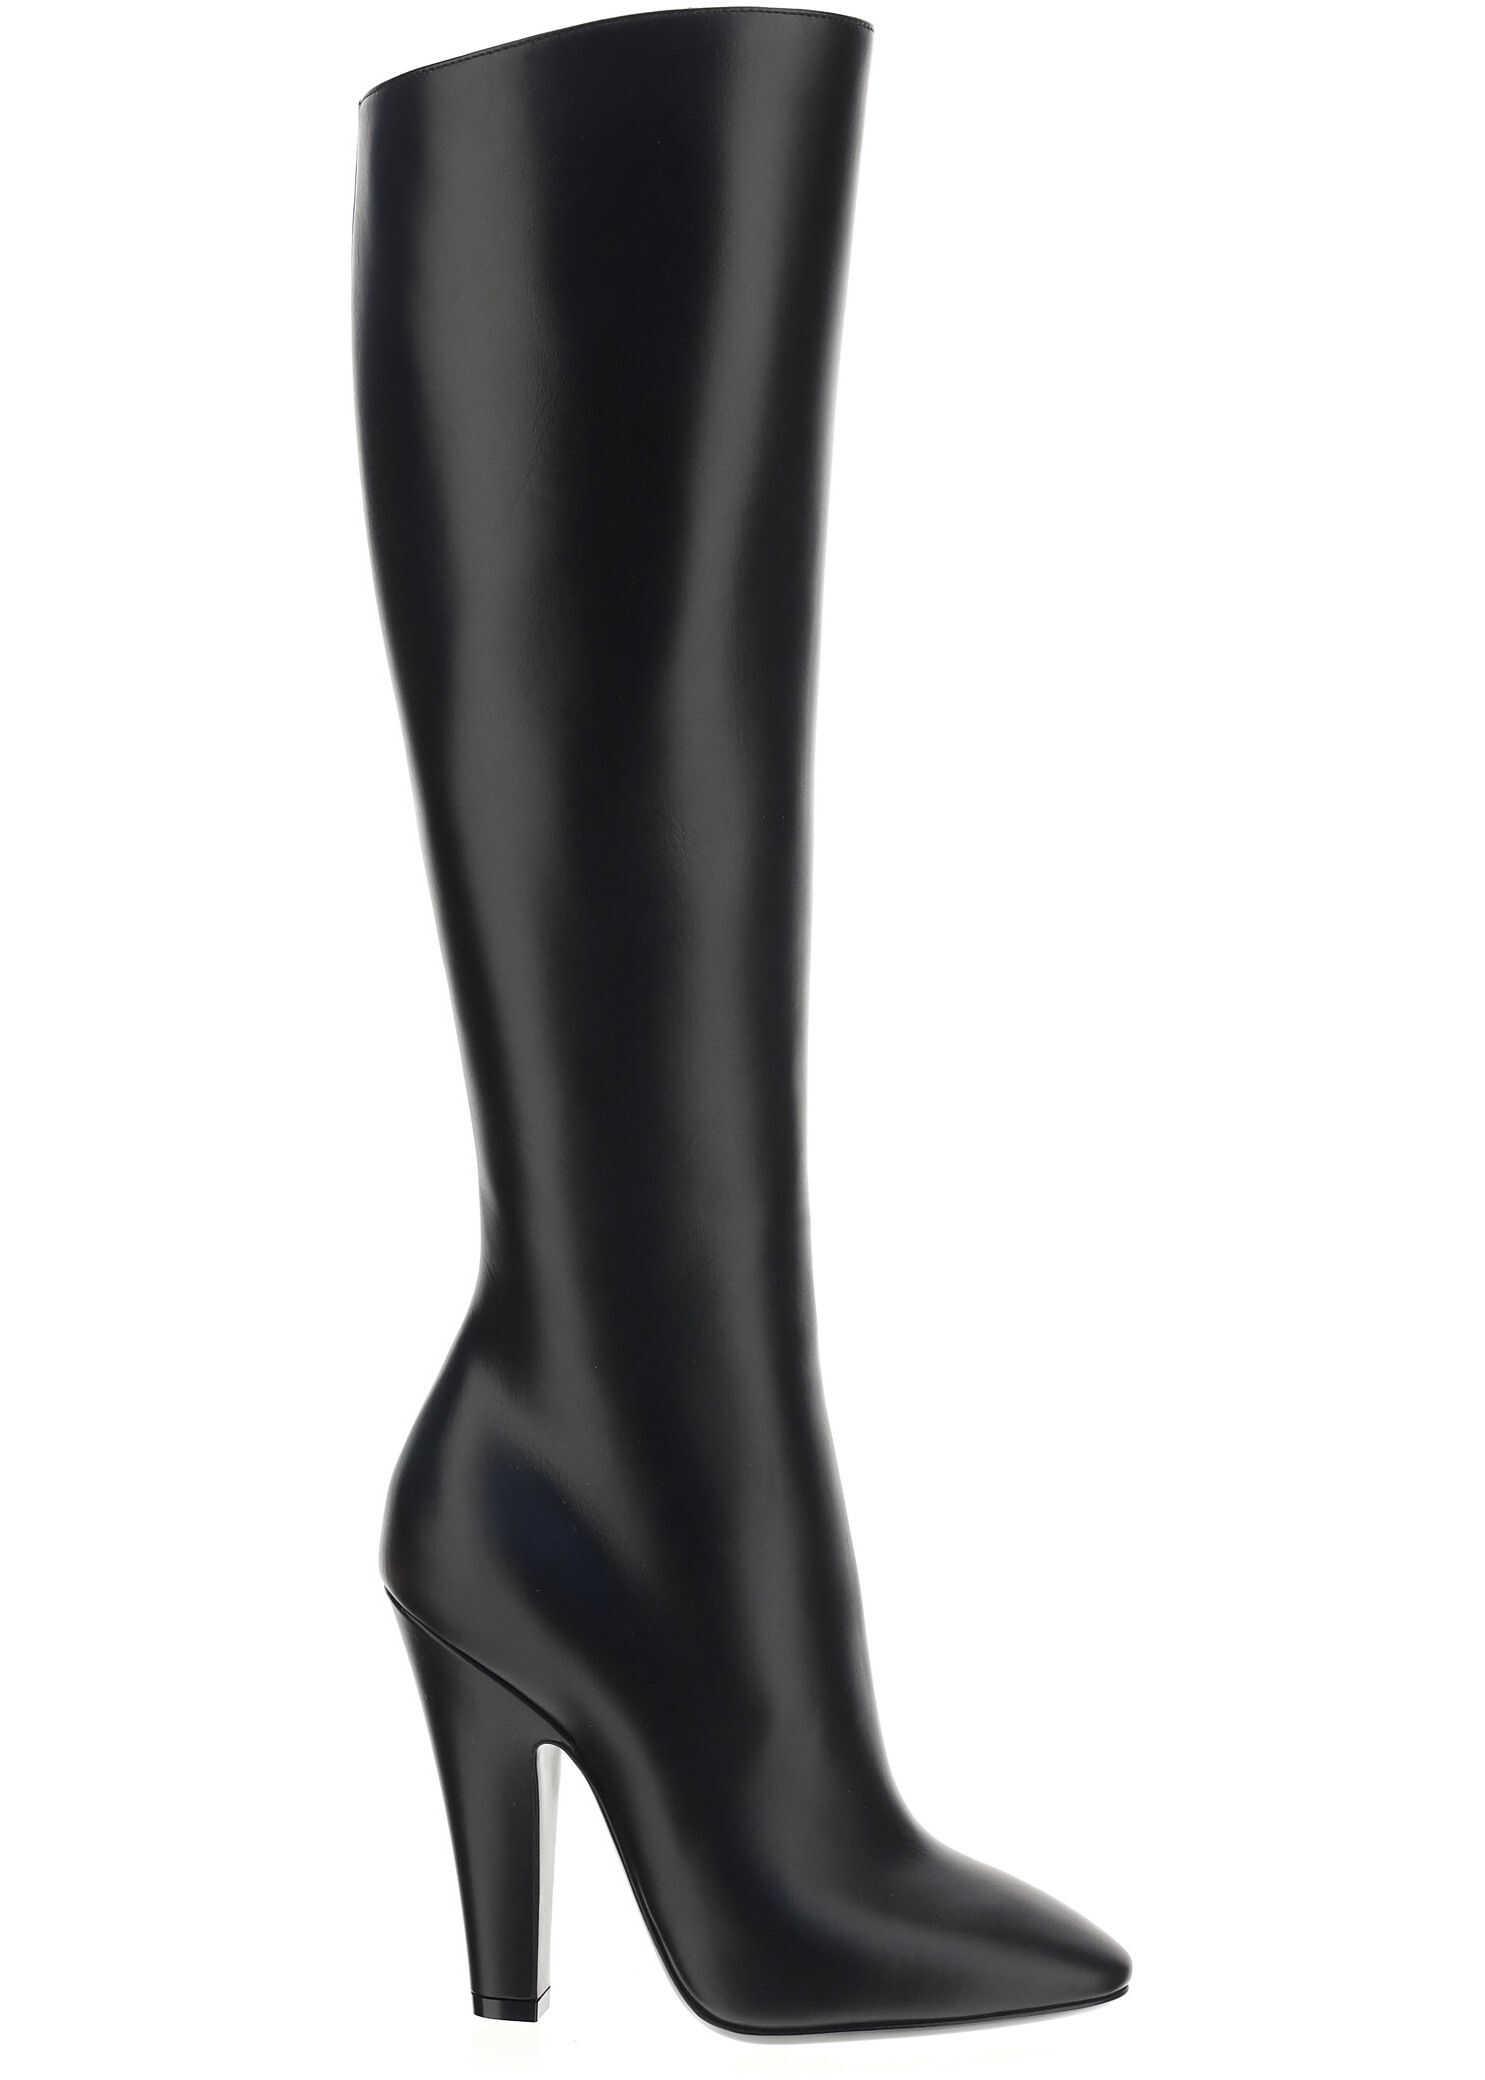 Saint Laurent Boots 6579222W700 NERO imagine b-mall.ro